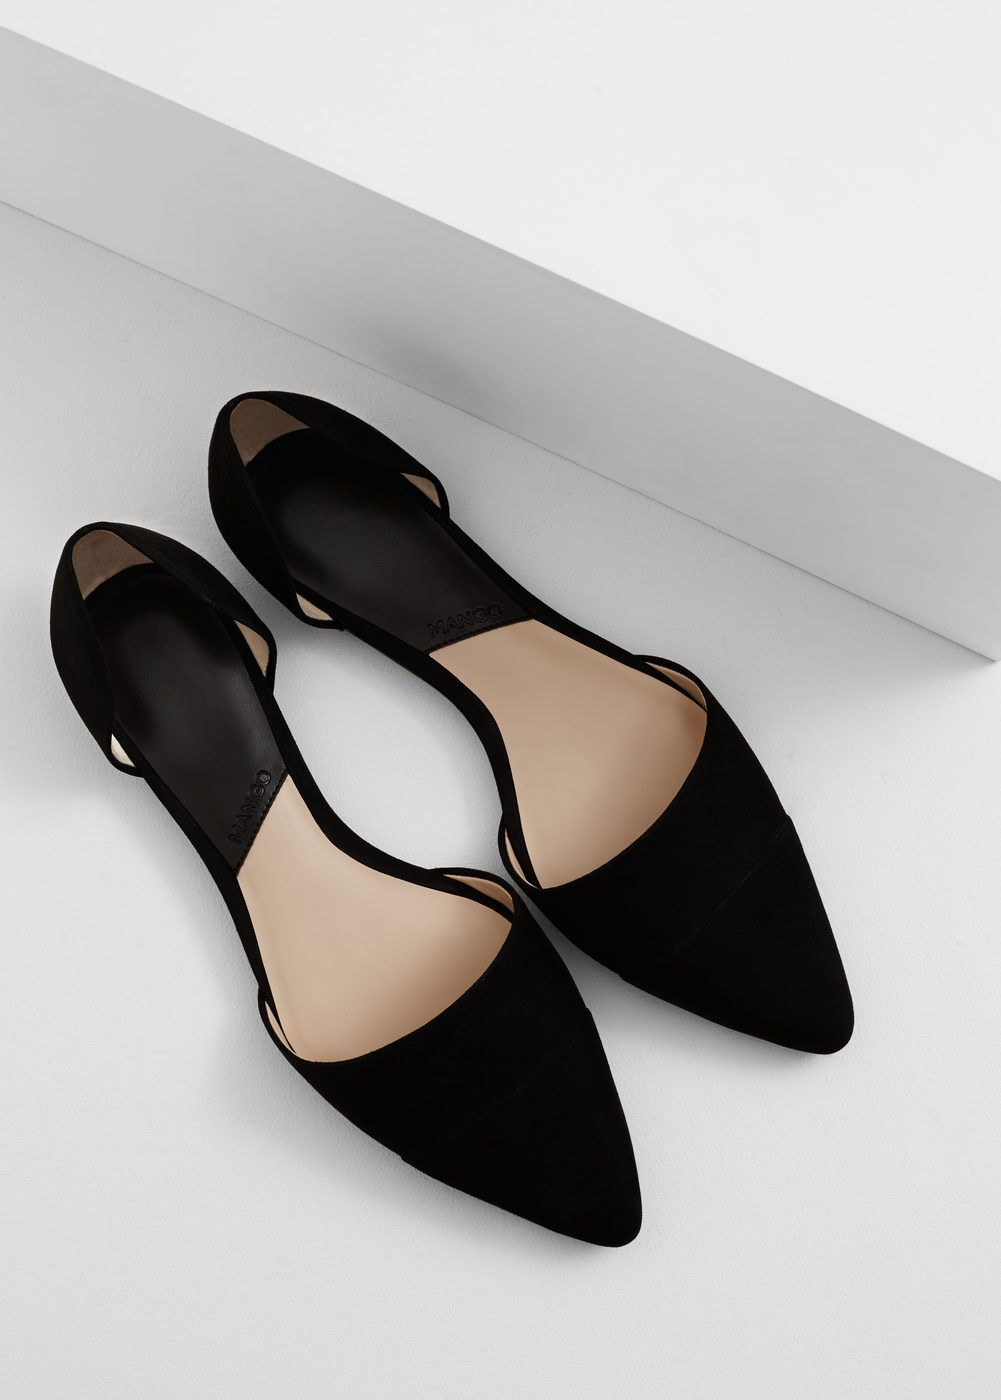 Zapato plano punta Mujer   Zapatos planos, Zapatos negros